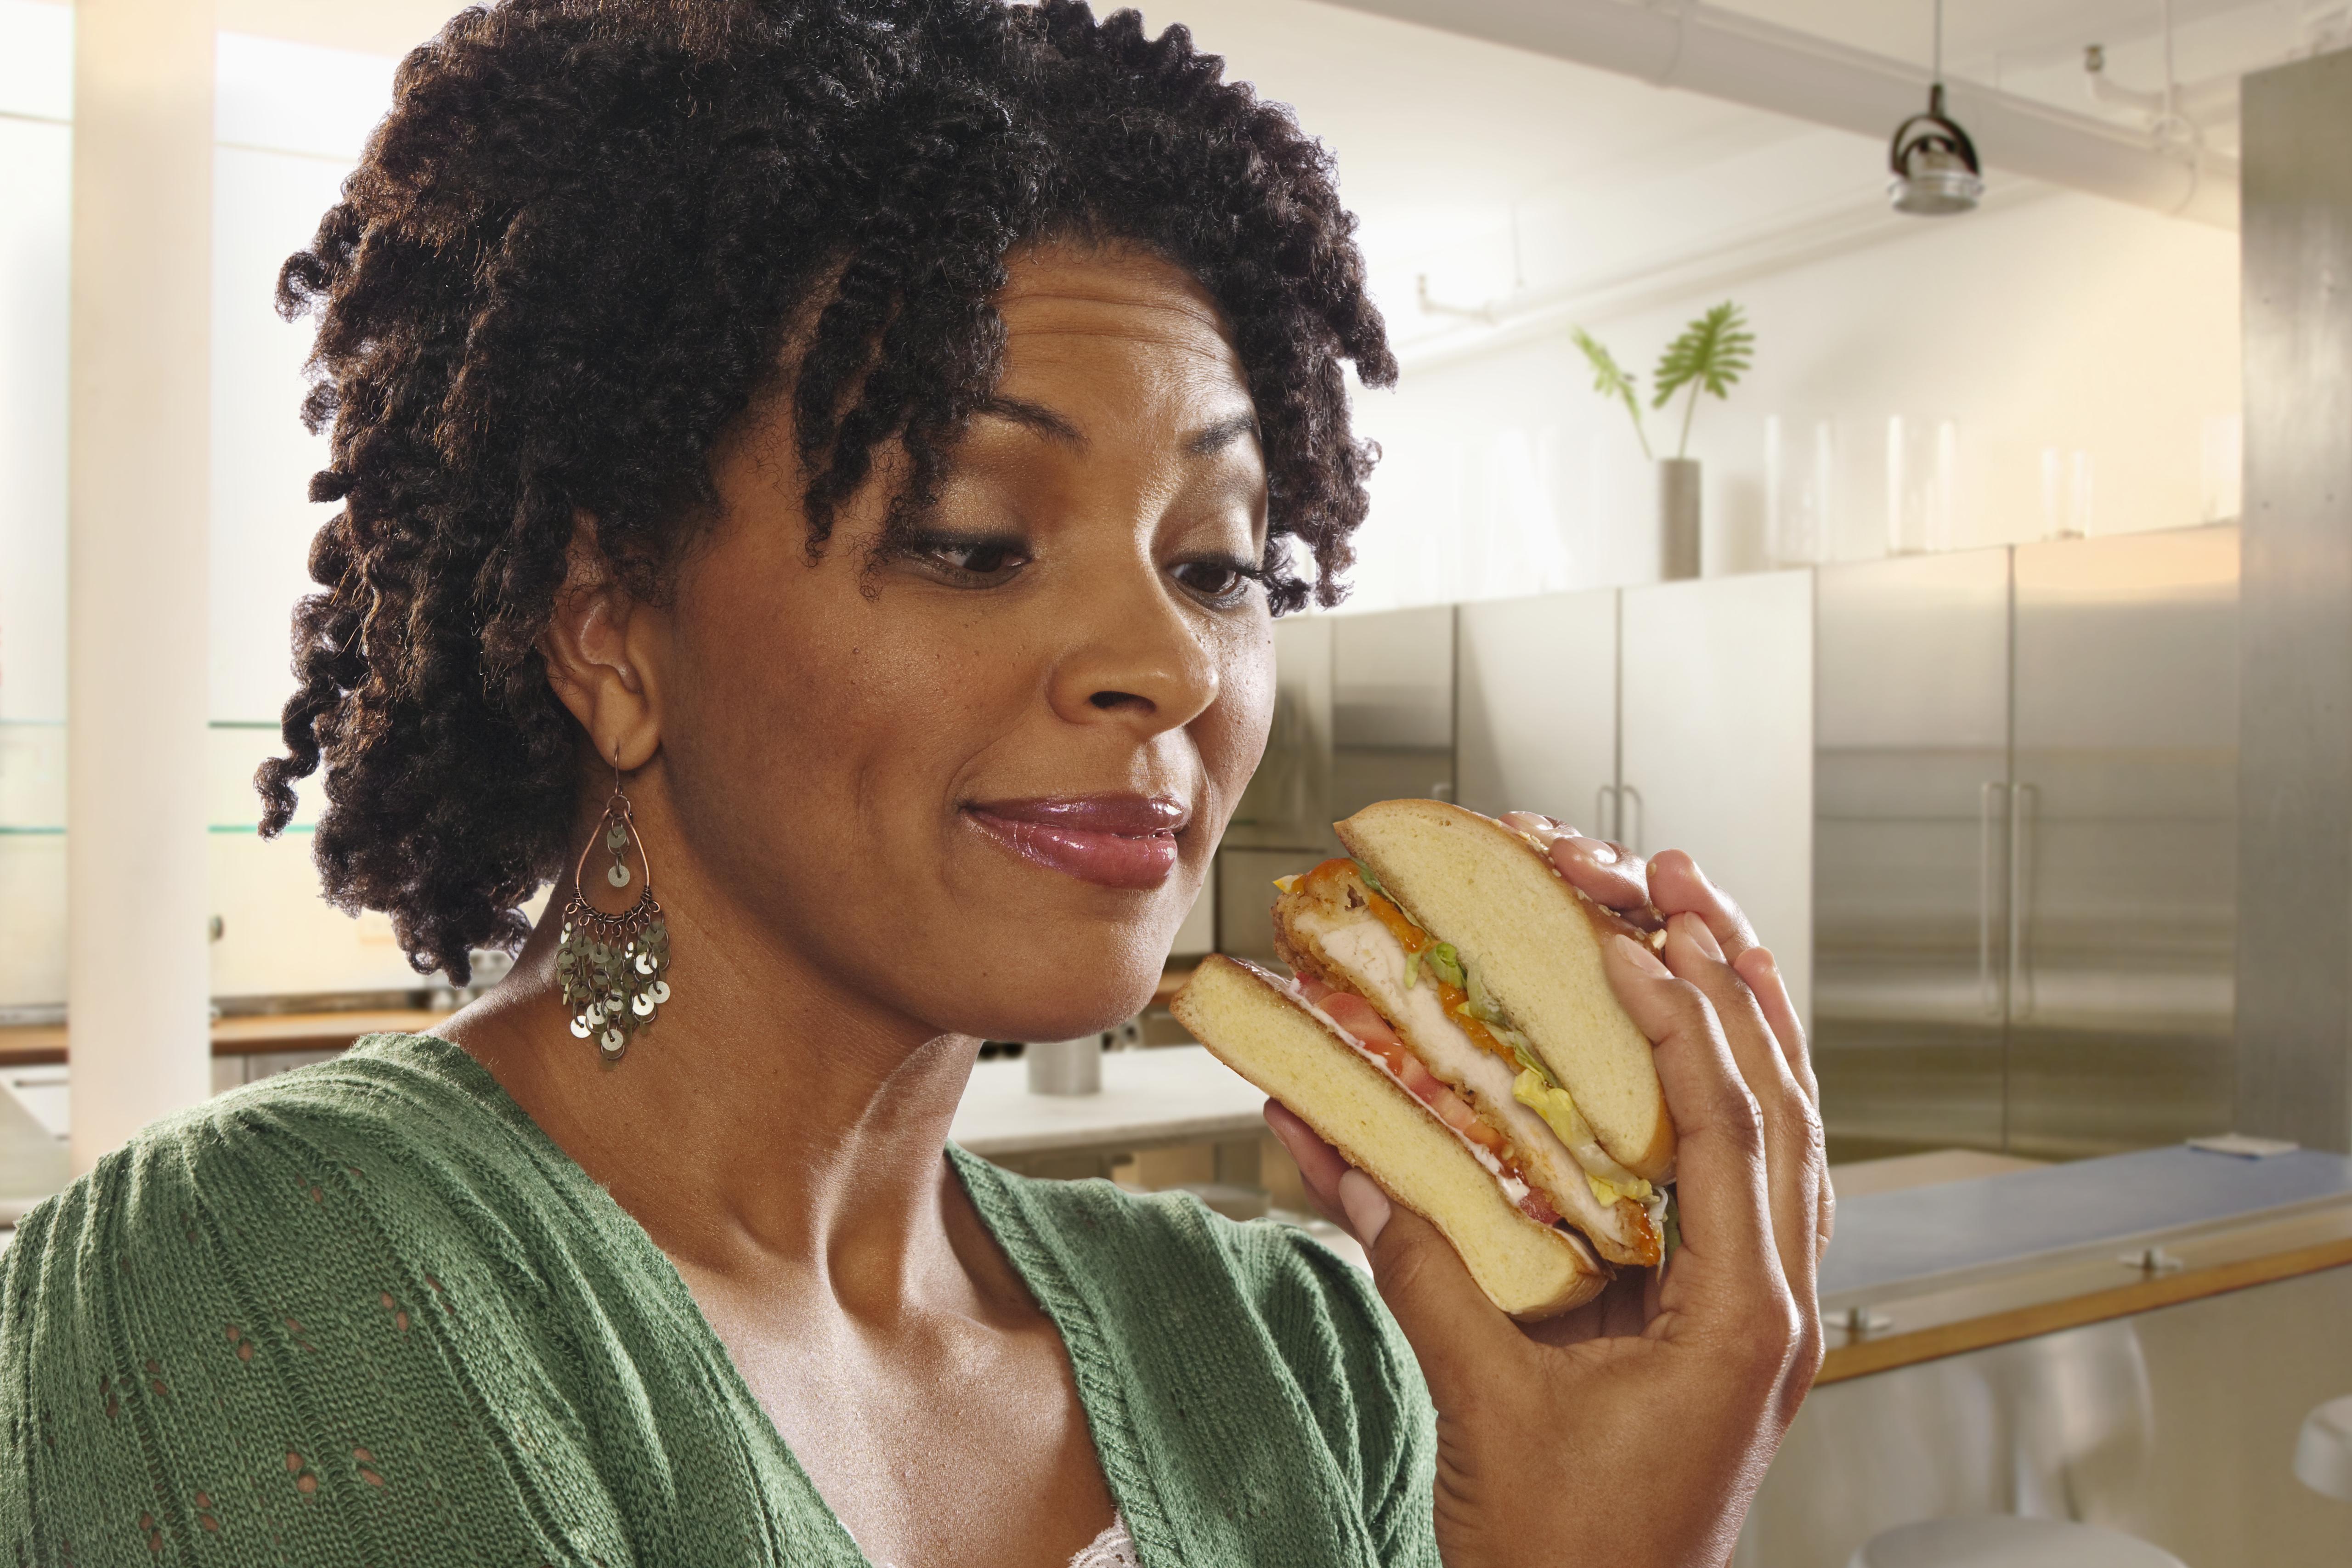 African American woman eating sandwich